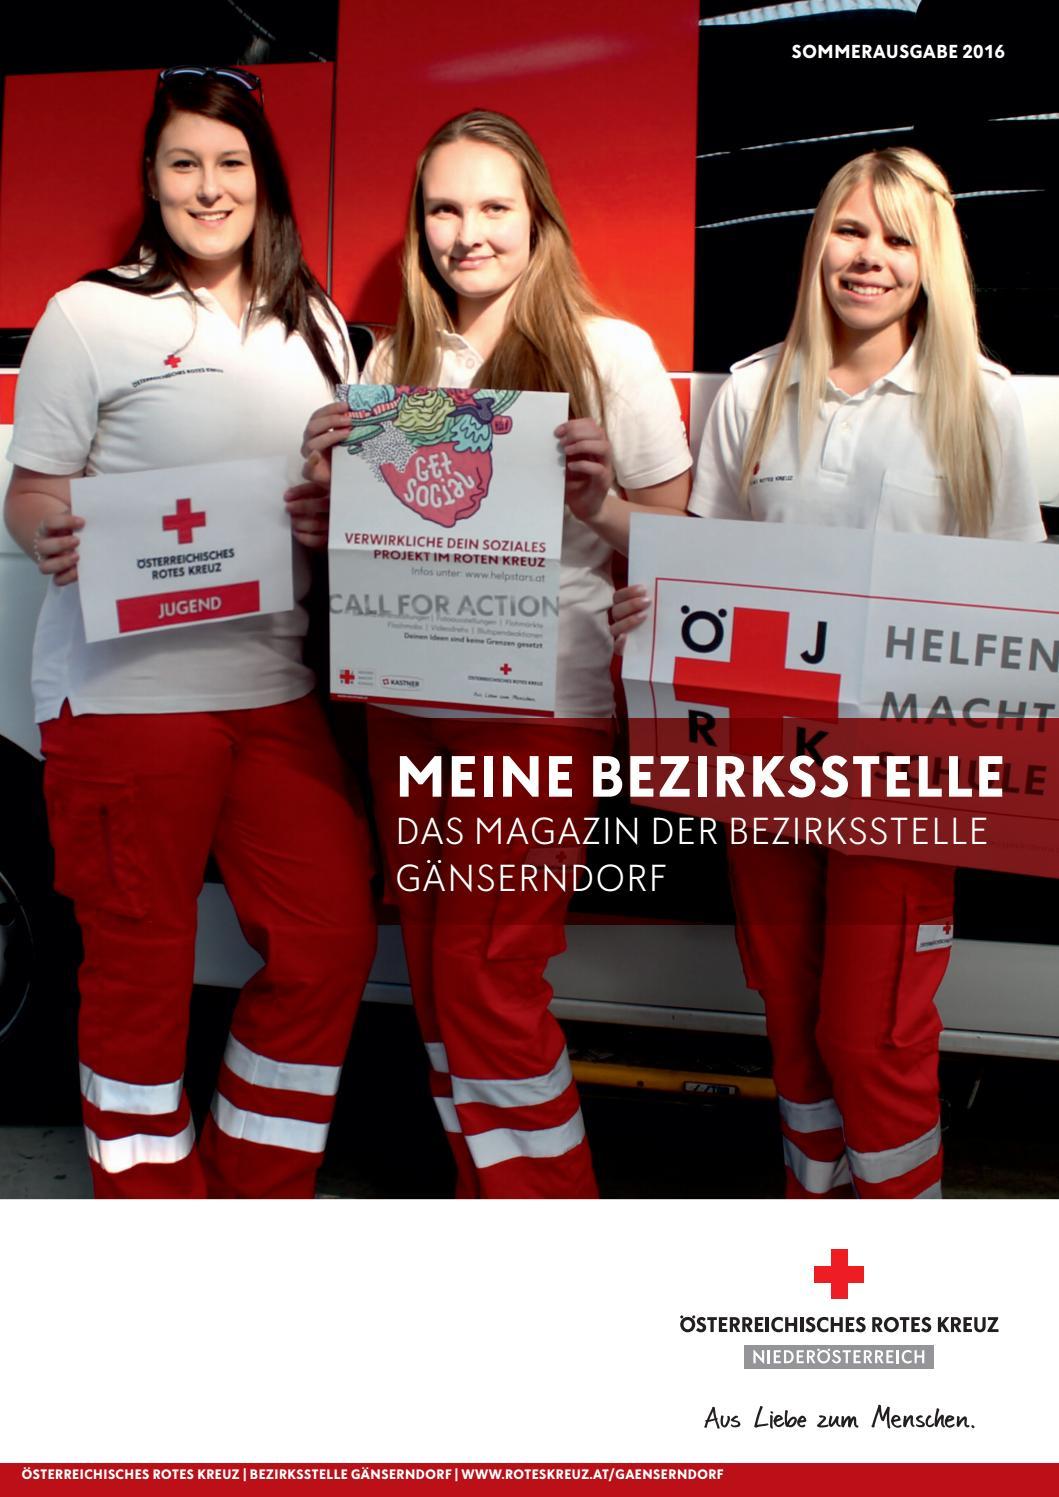 TOP Students 2013/14 - BHAK / BHAS Gnserndorf